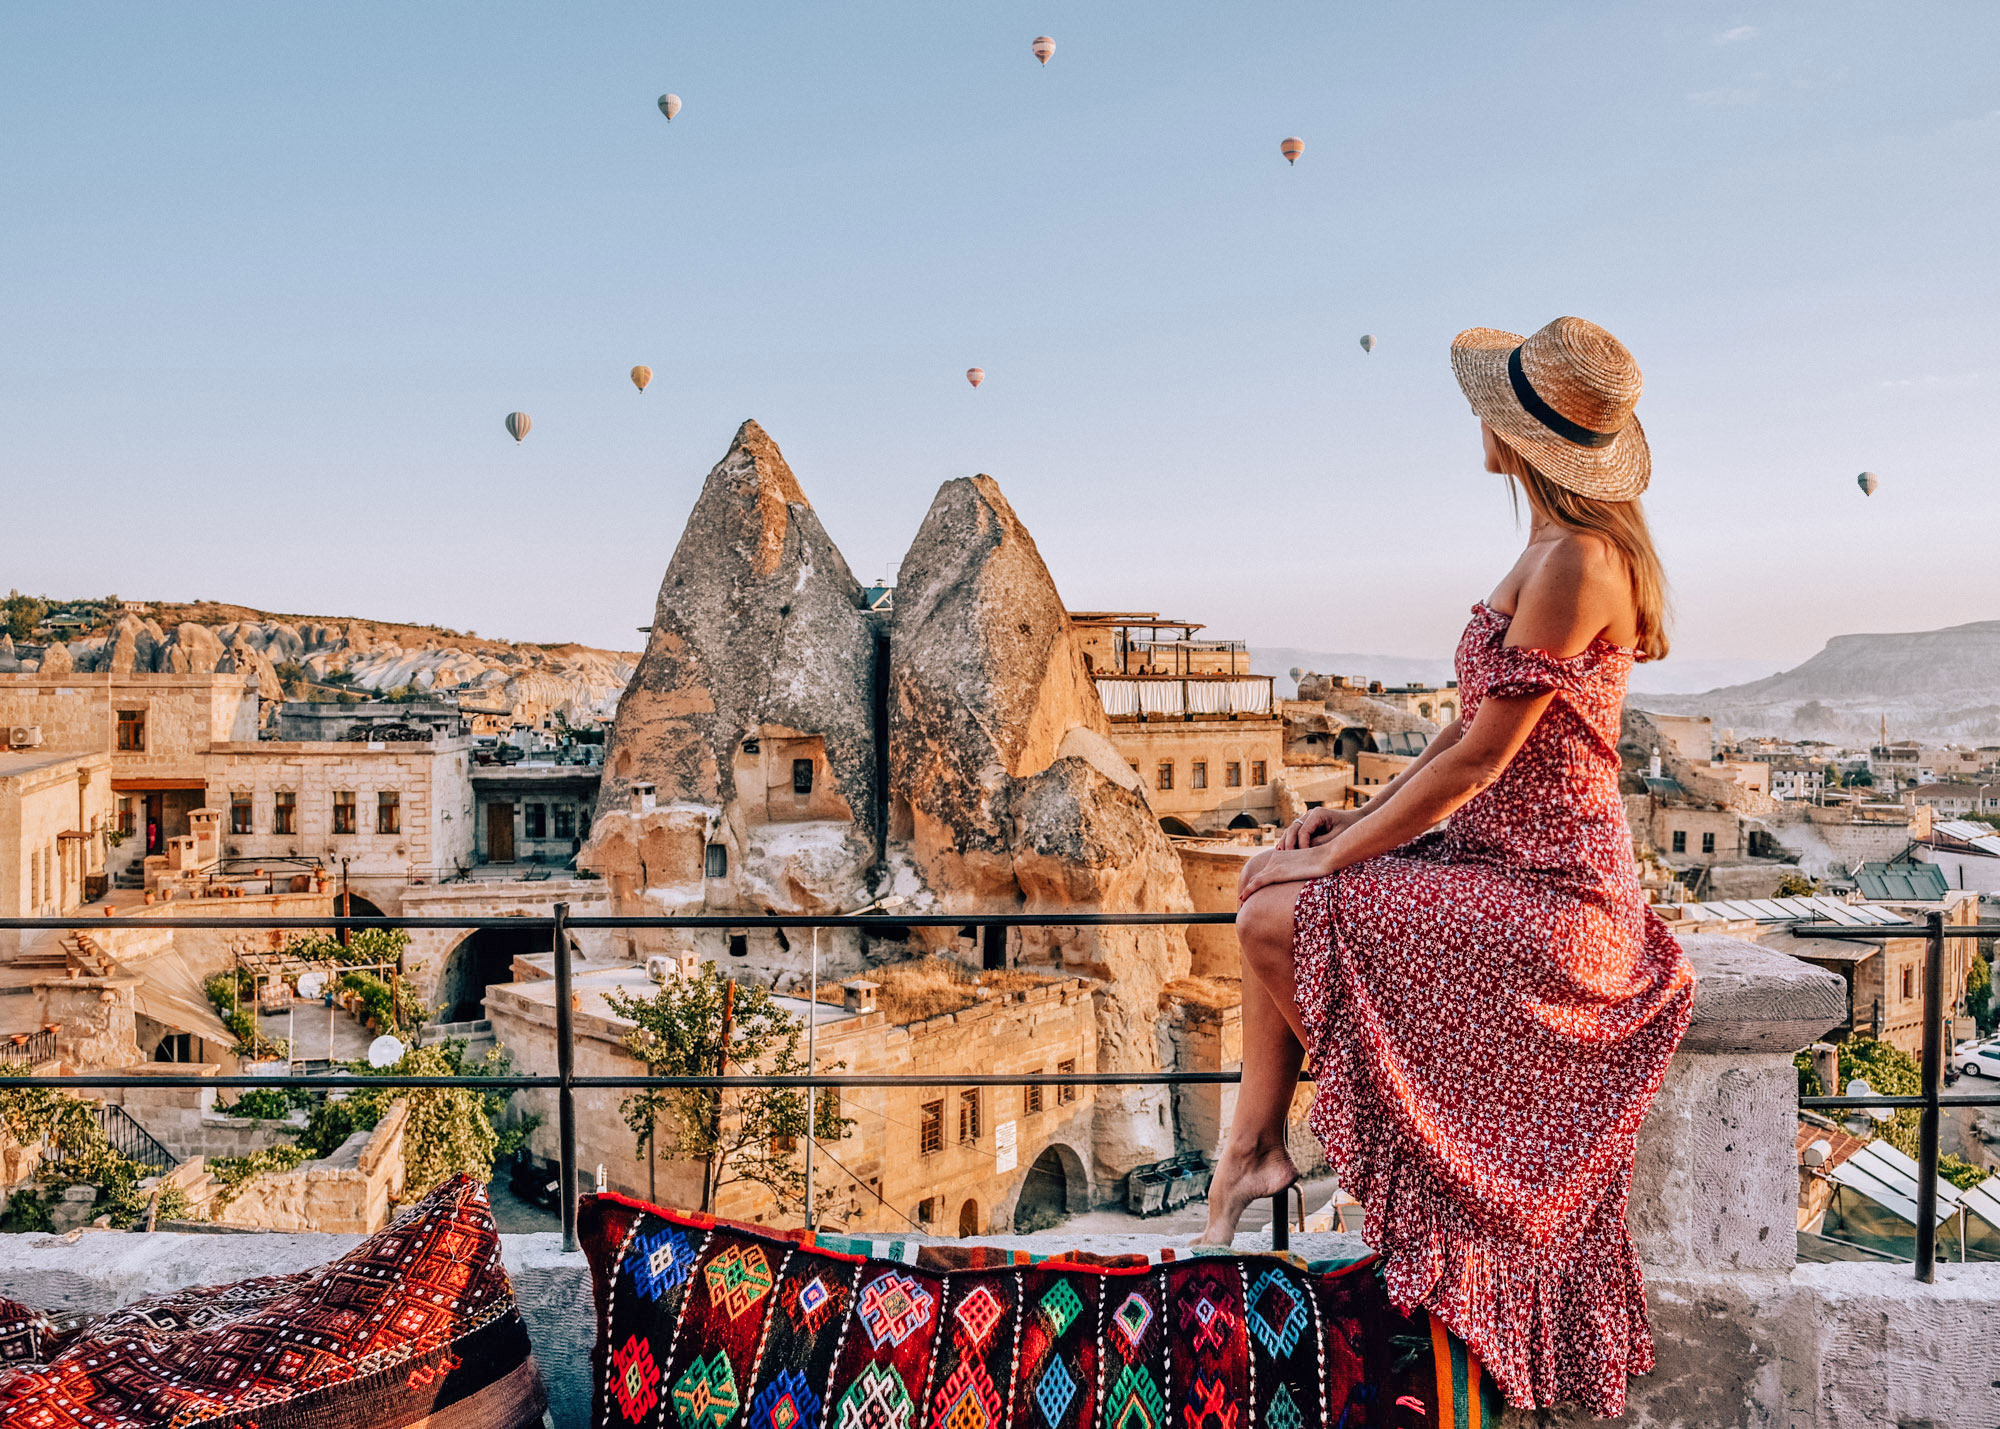 Cappadocia Turkey Tourist Attractions